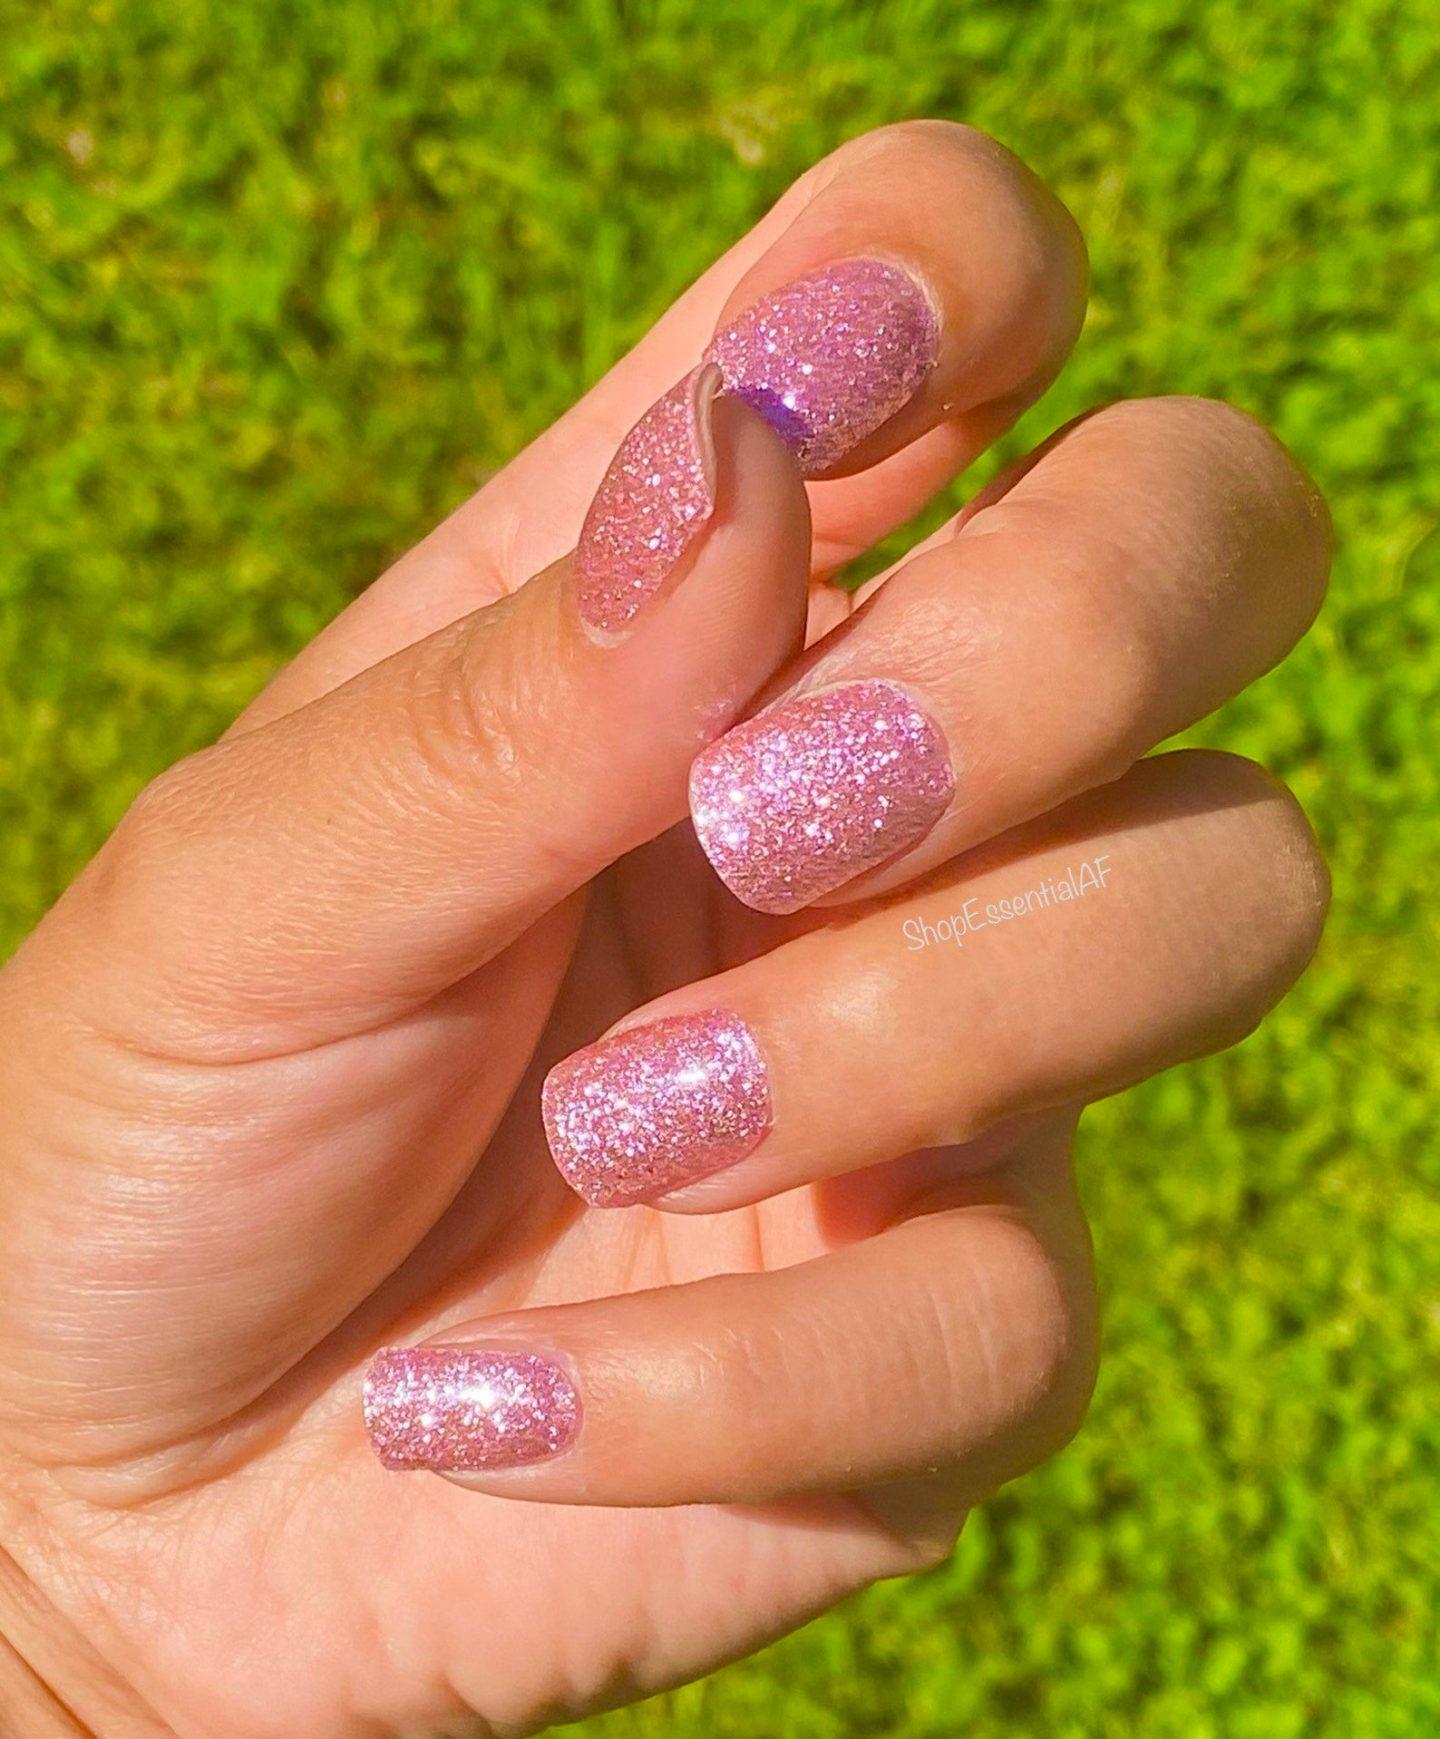 Short pink glitter nail polish wraps